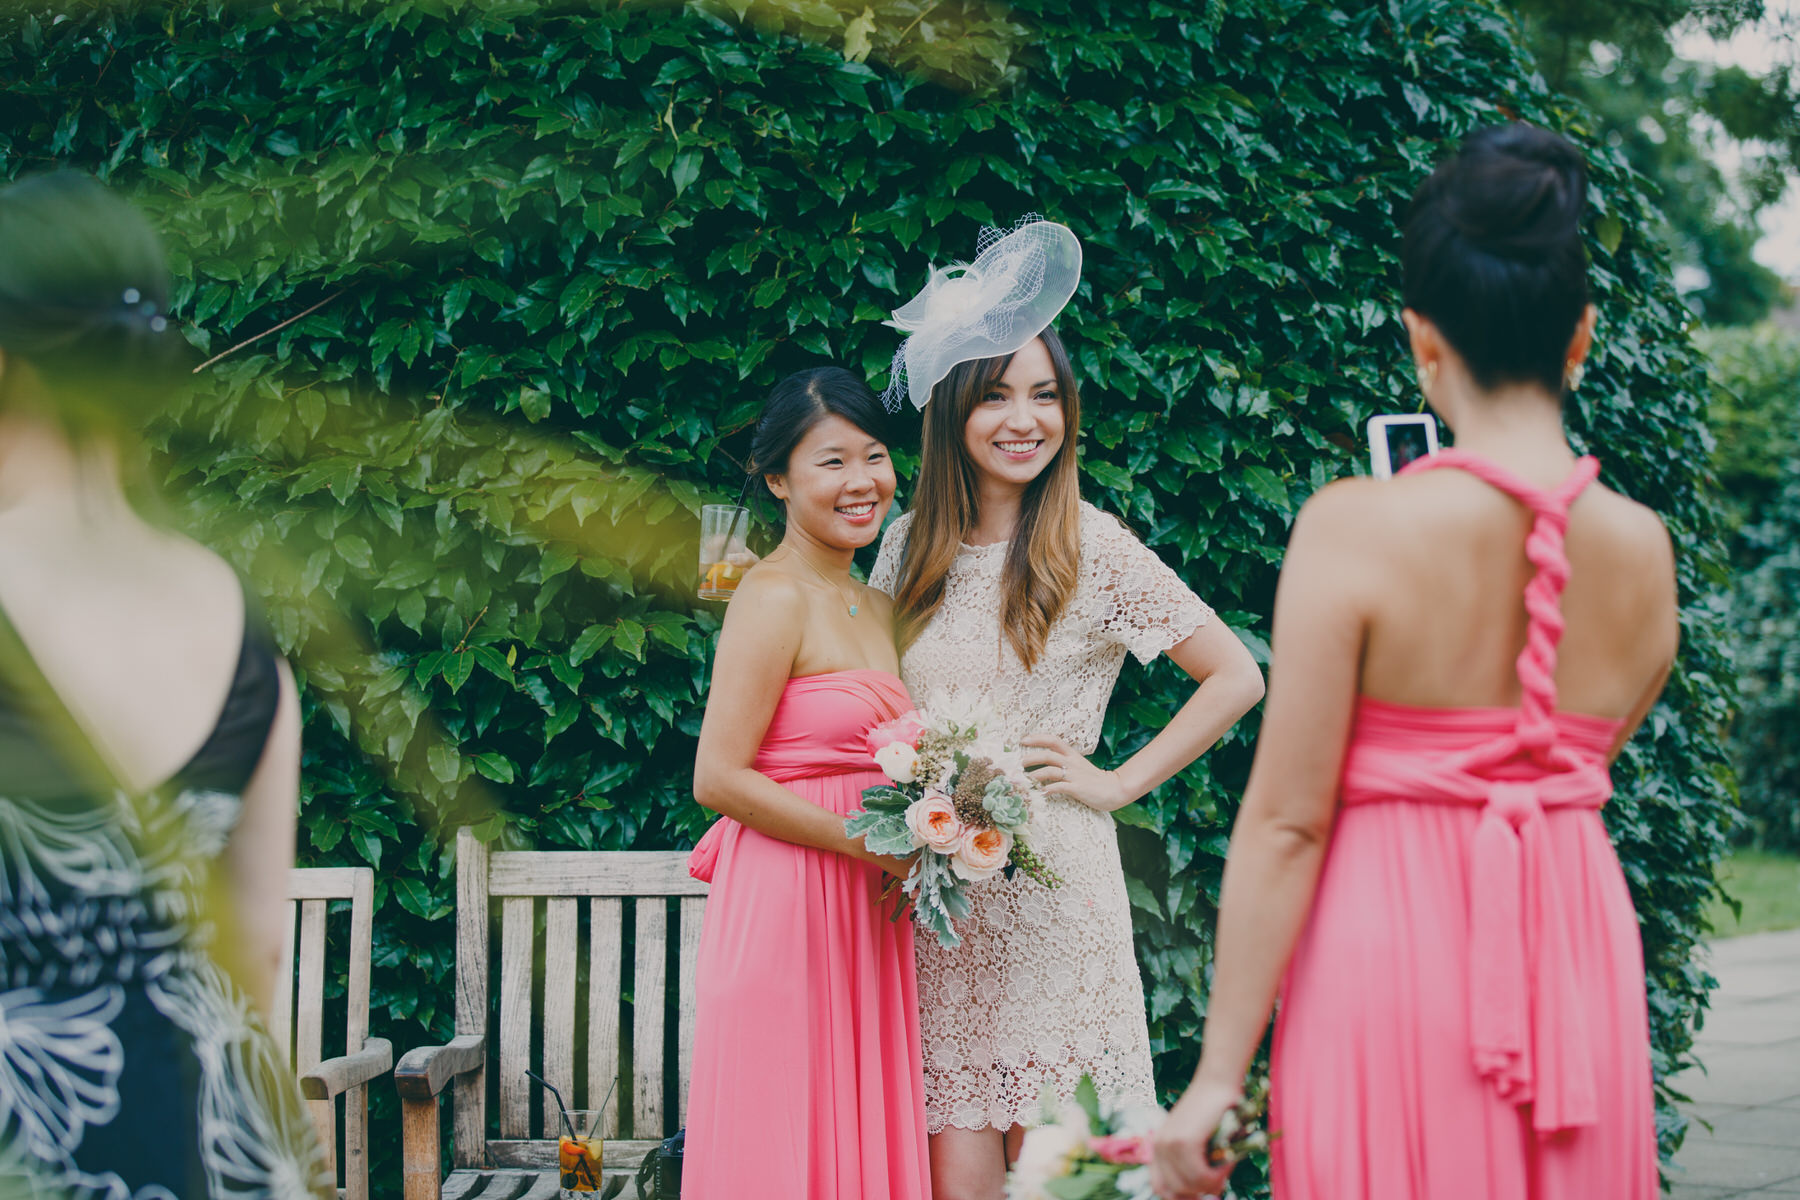 244 Surrey wedding reception drinks guest candid reportage.jpg